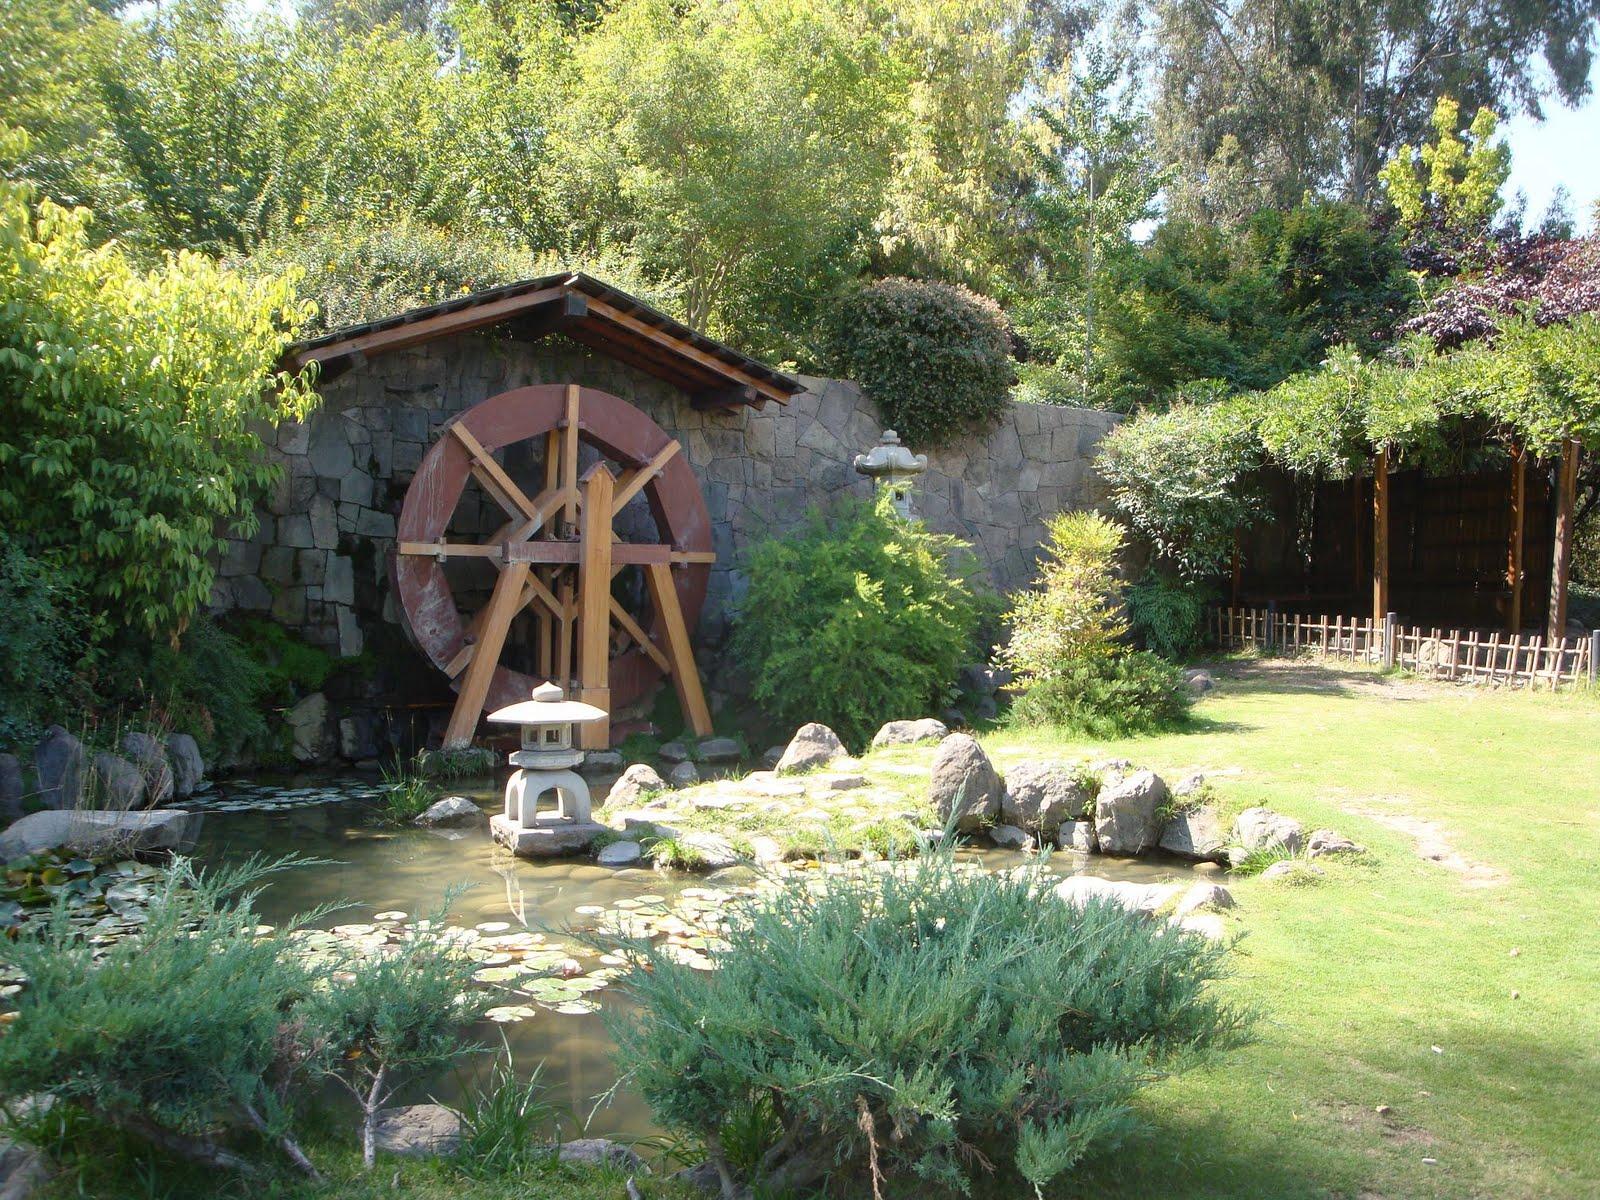 Viaje a sudam rica cerro de san cristobal jardin japones for Jardin japones de santiago